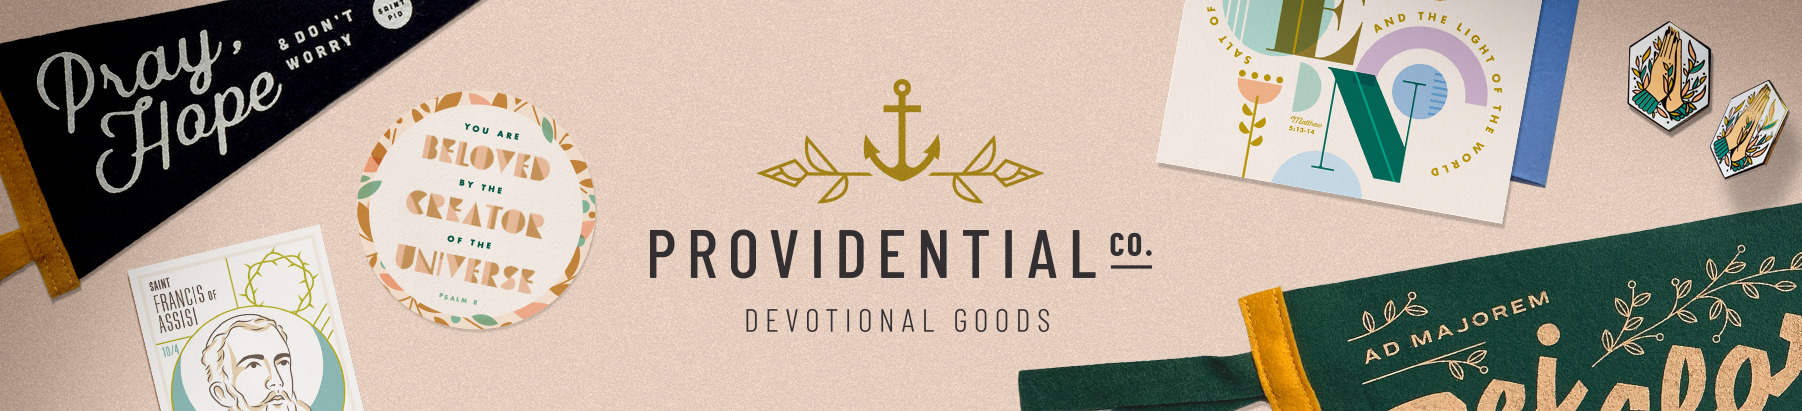 providentialco-banner-1802x411